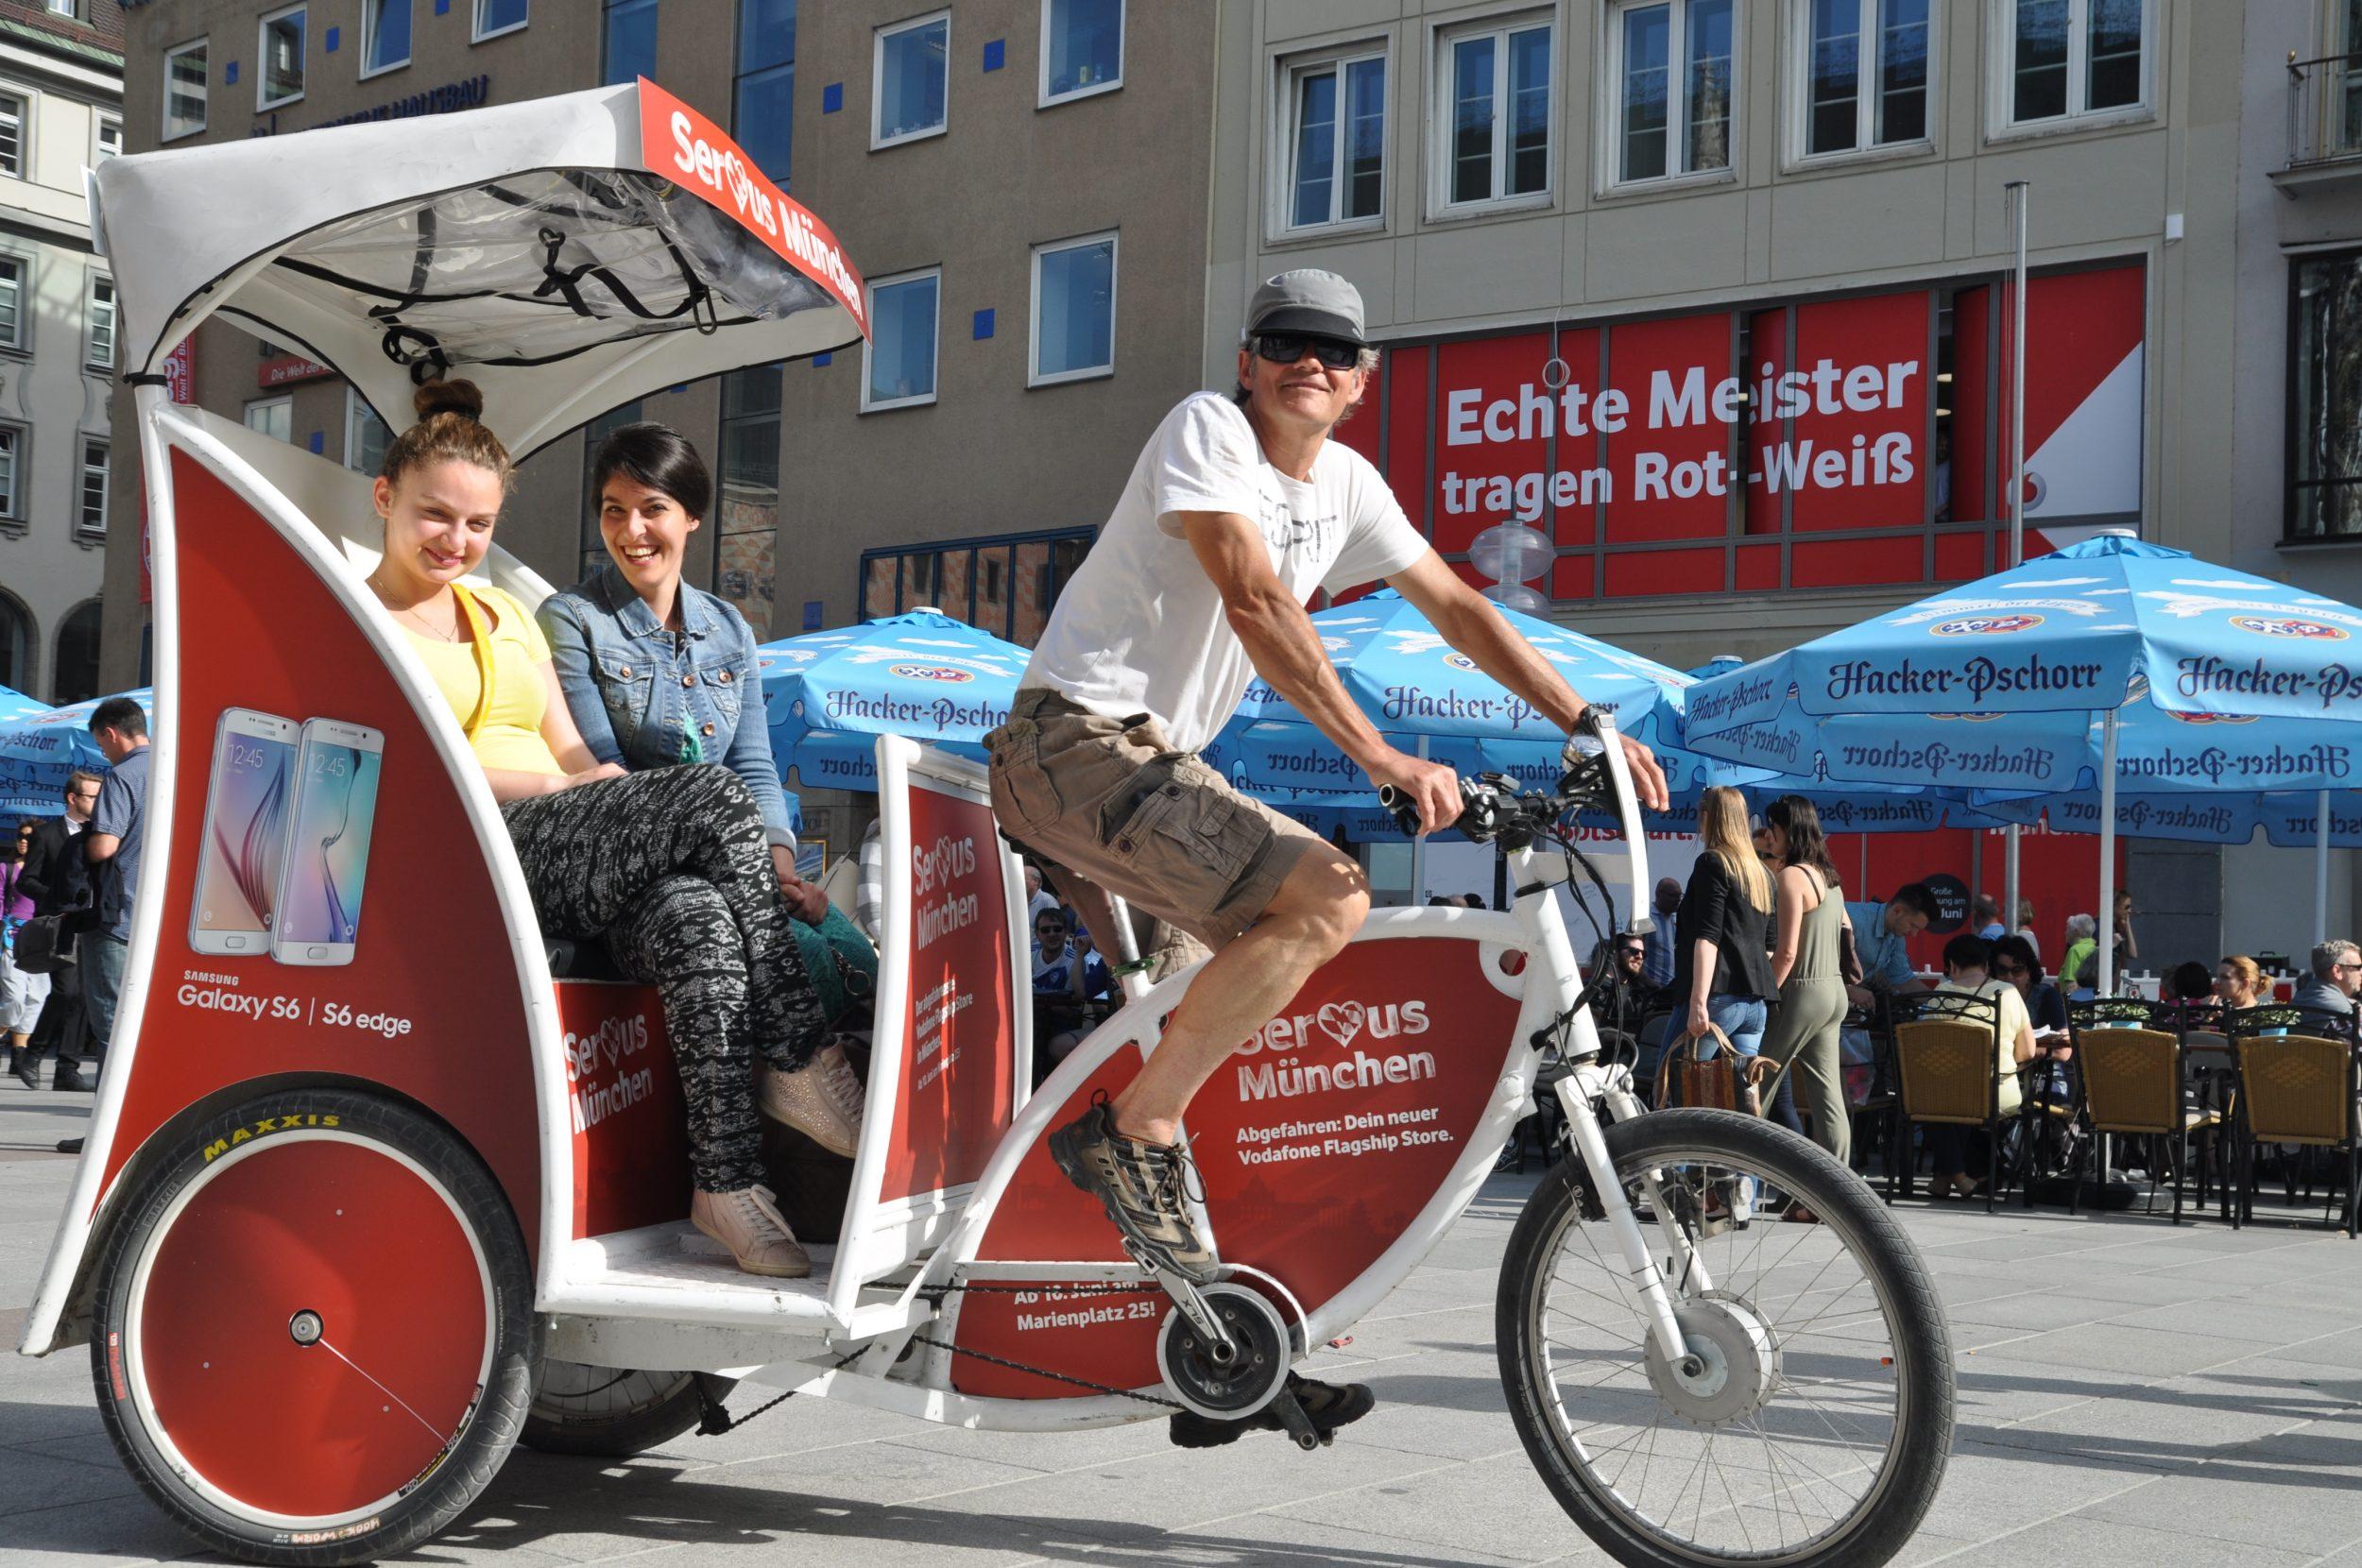 Rikscha in München spontan bestellen!